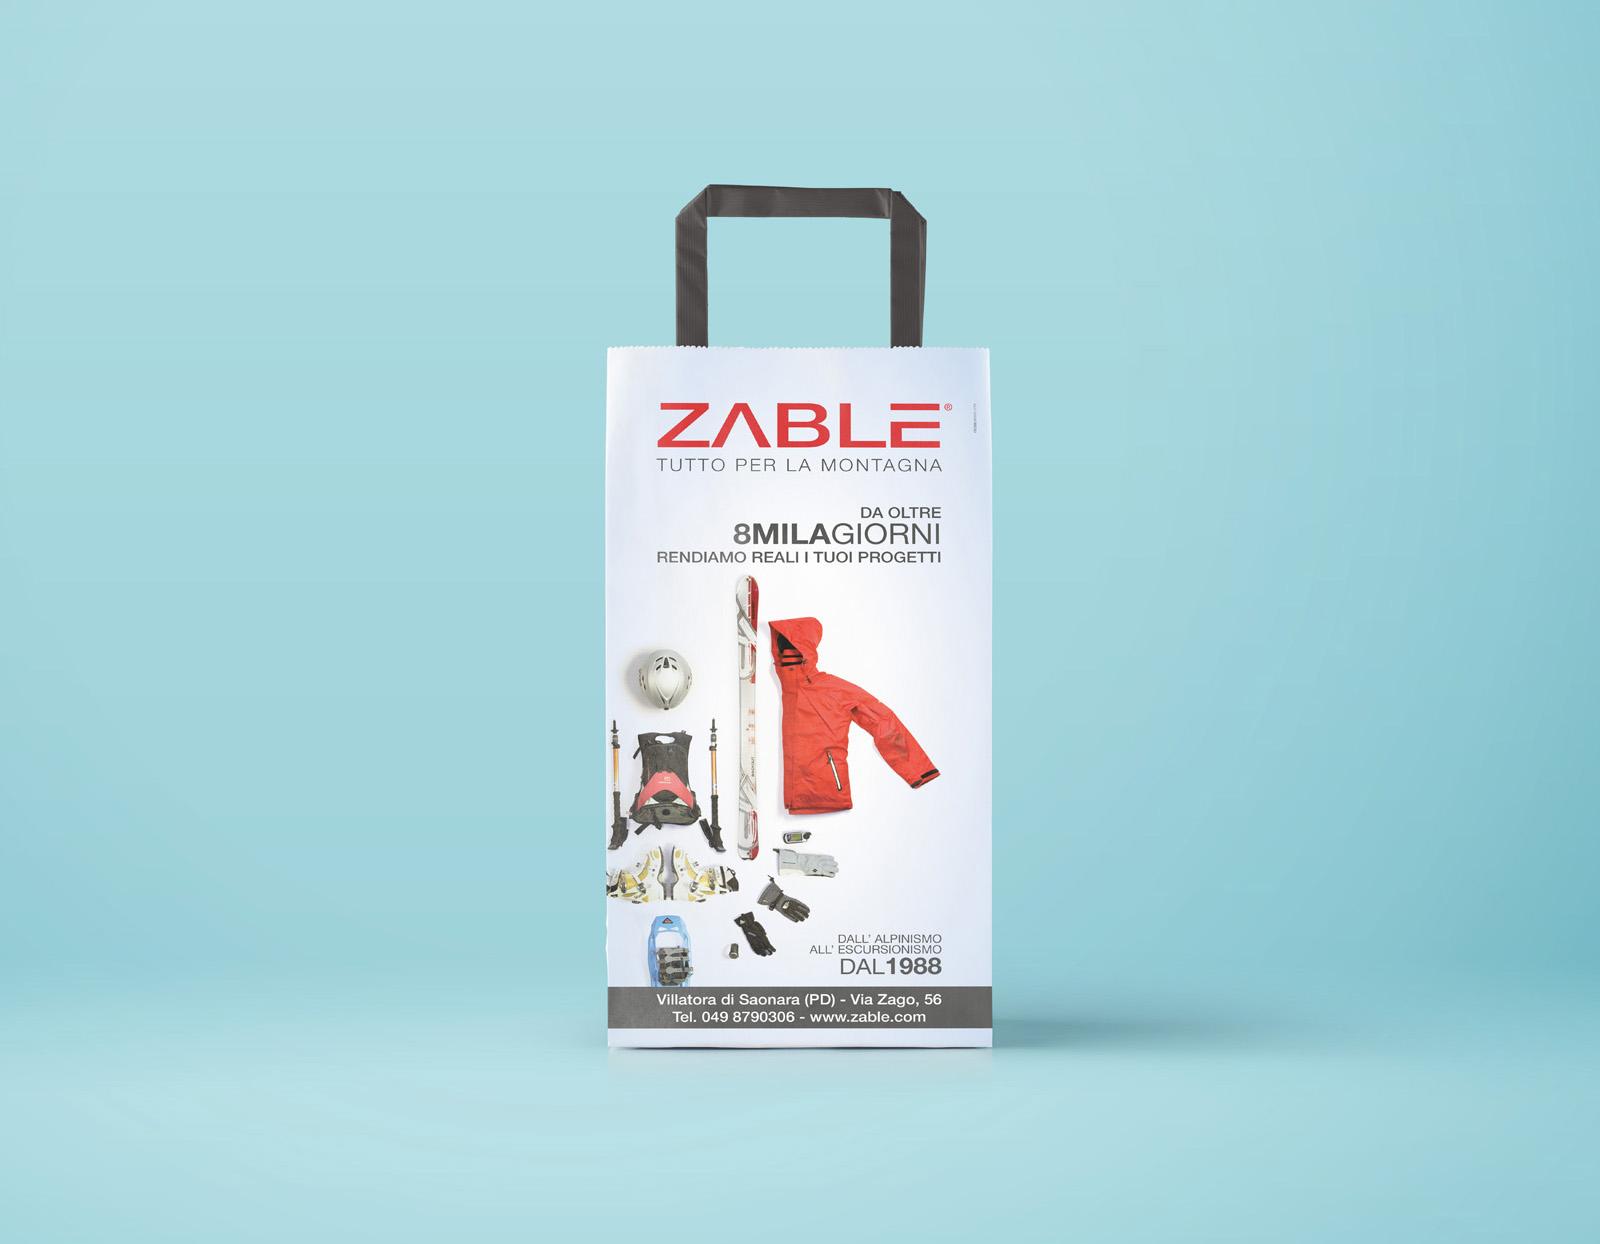 Campagna Zable 12.jpg